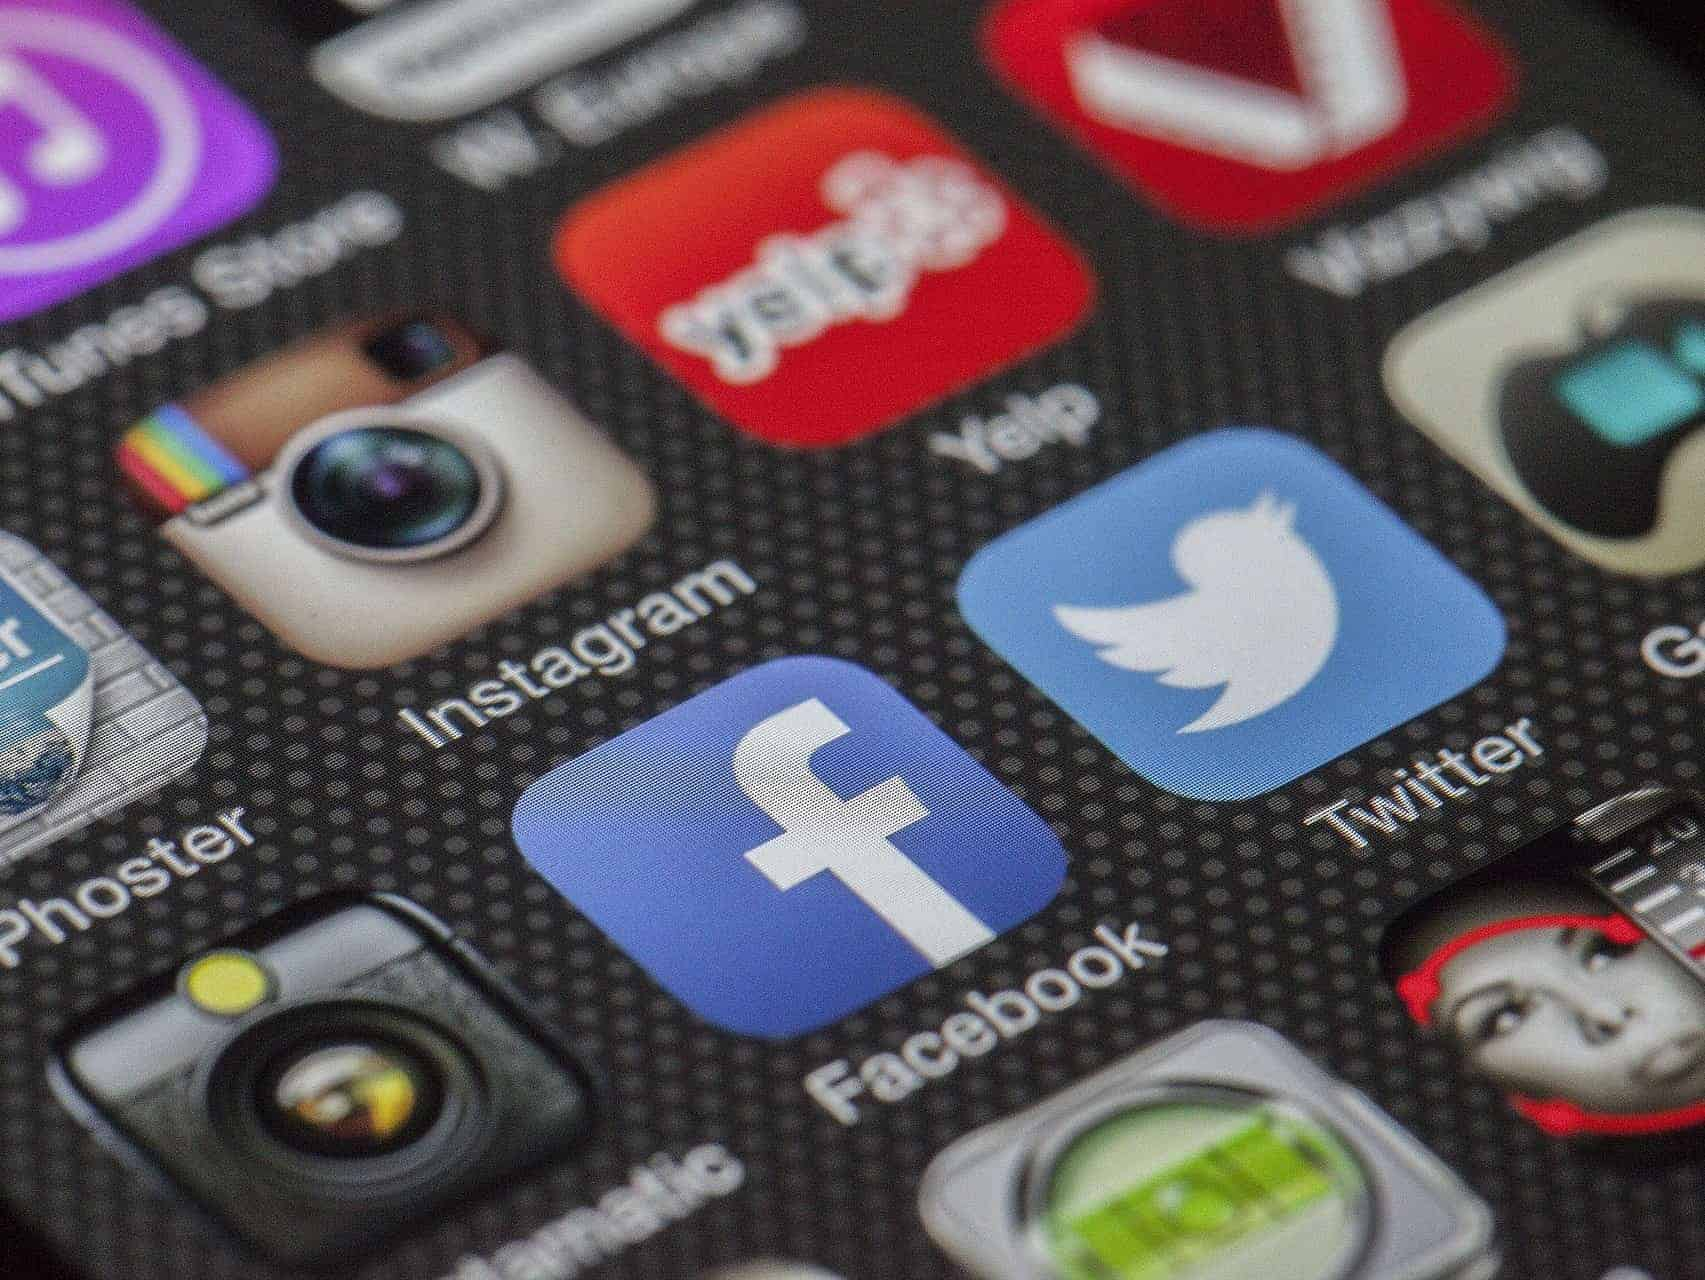 jaa blogi helposti sosiaaliseen mediaan